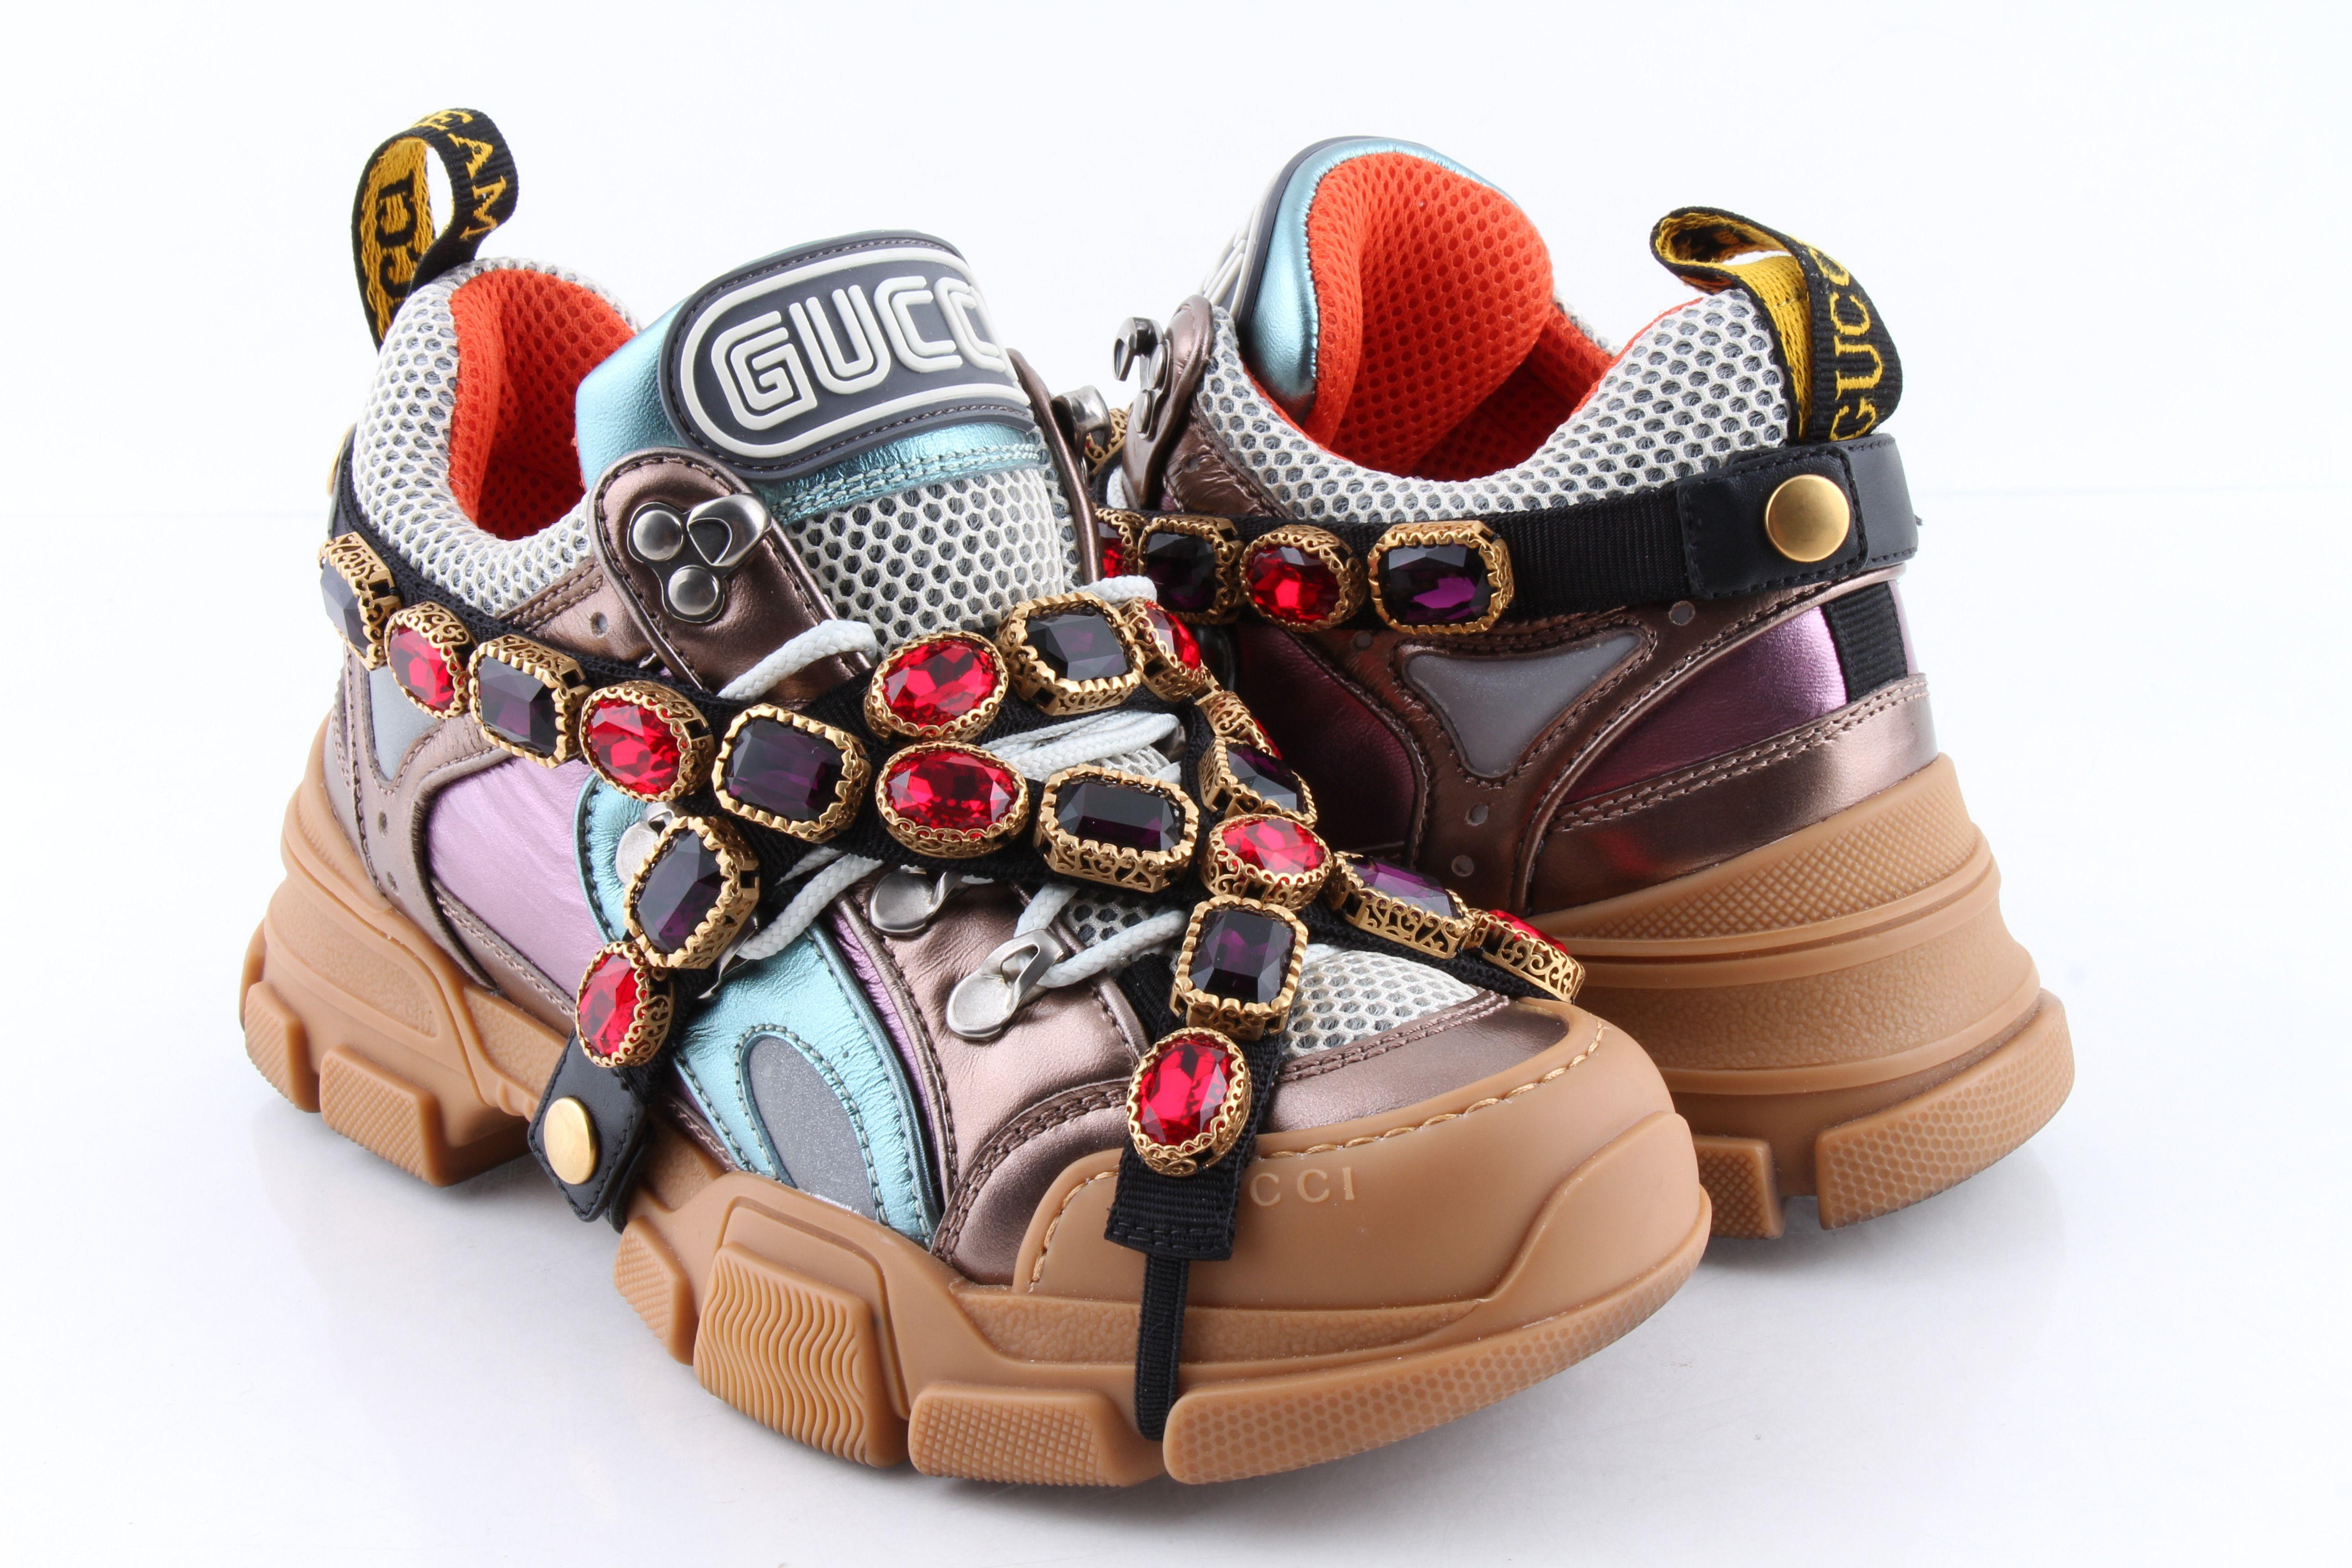 Gucci Flashtrek Sneaker Crystal Shoe